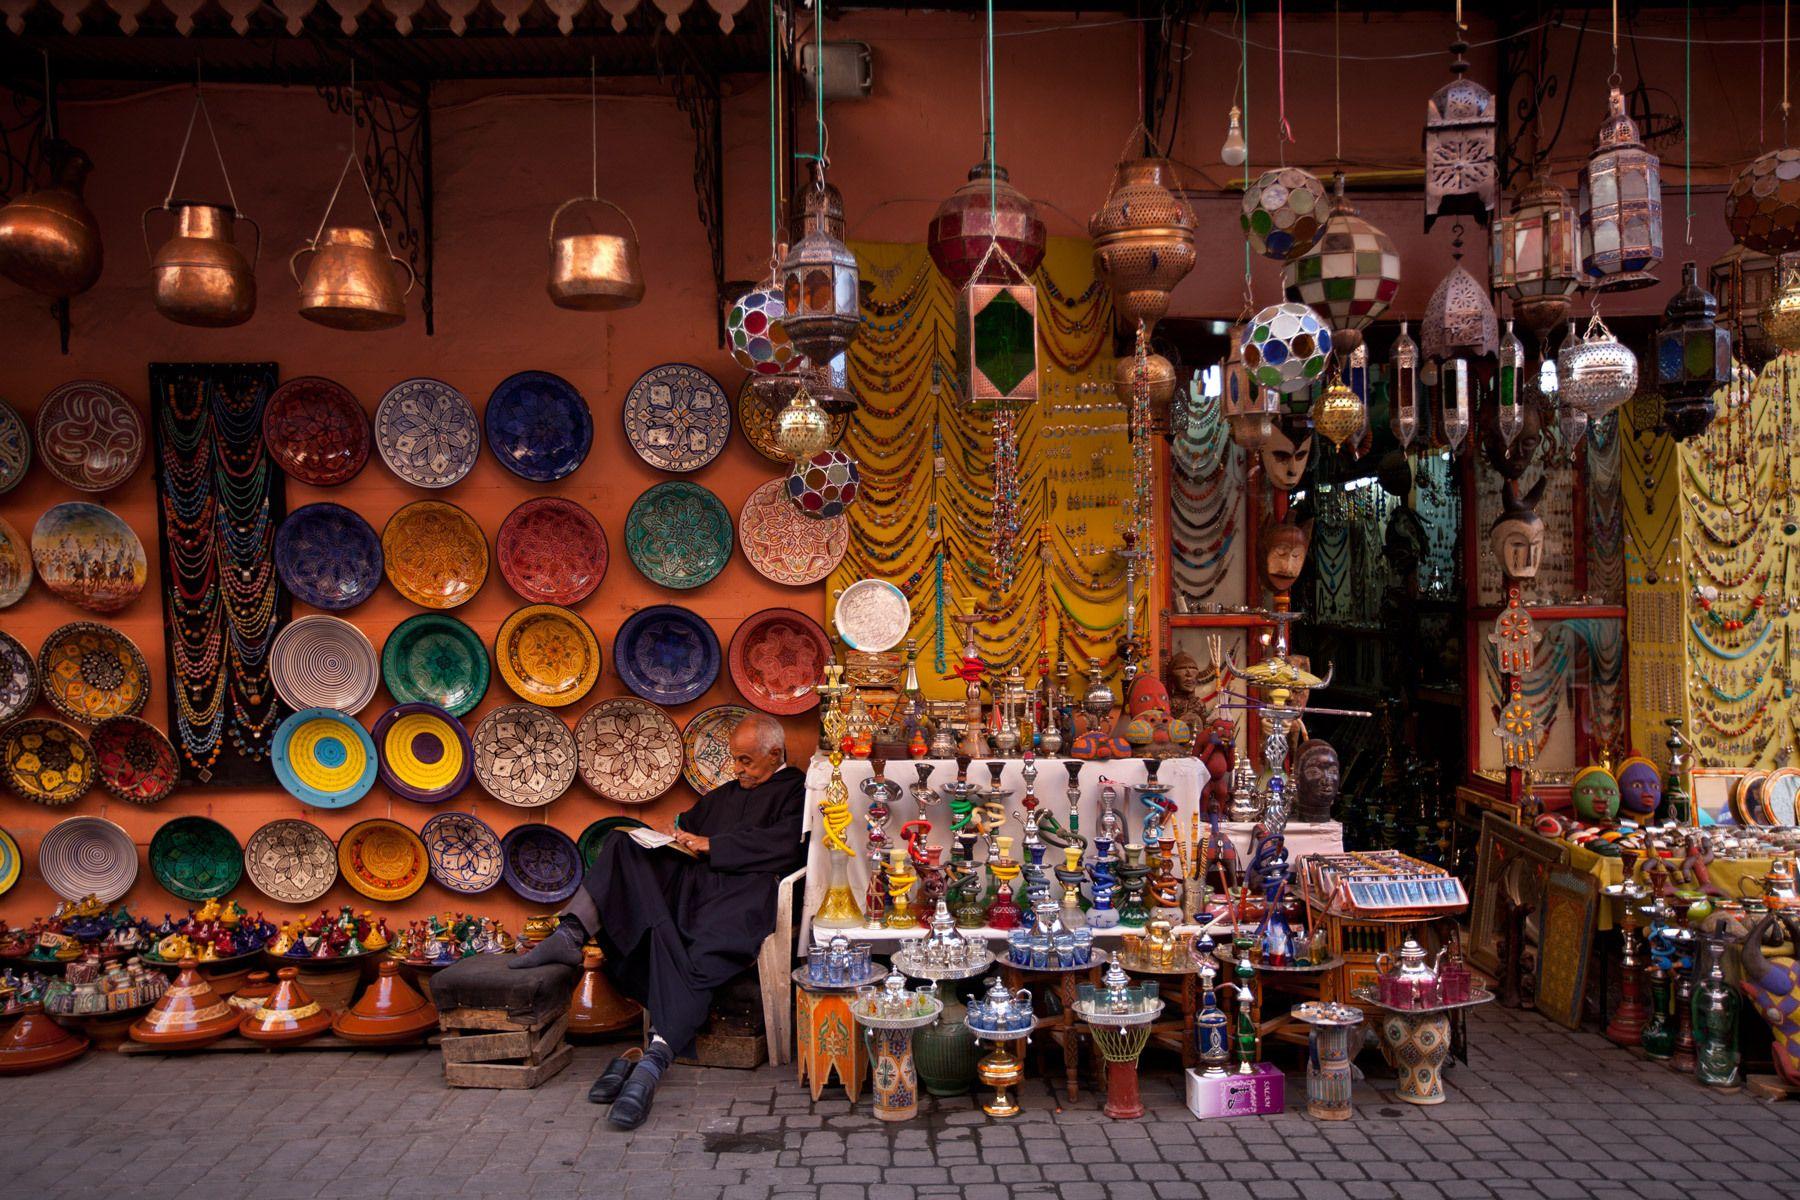 15_1r2010_1018_marrakesh037.jpg